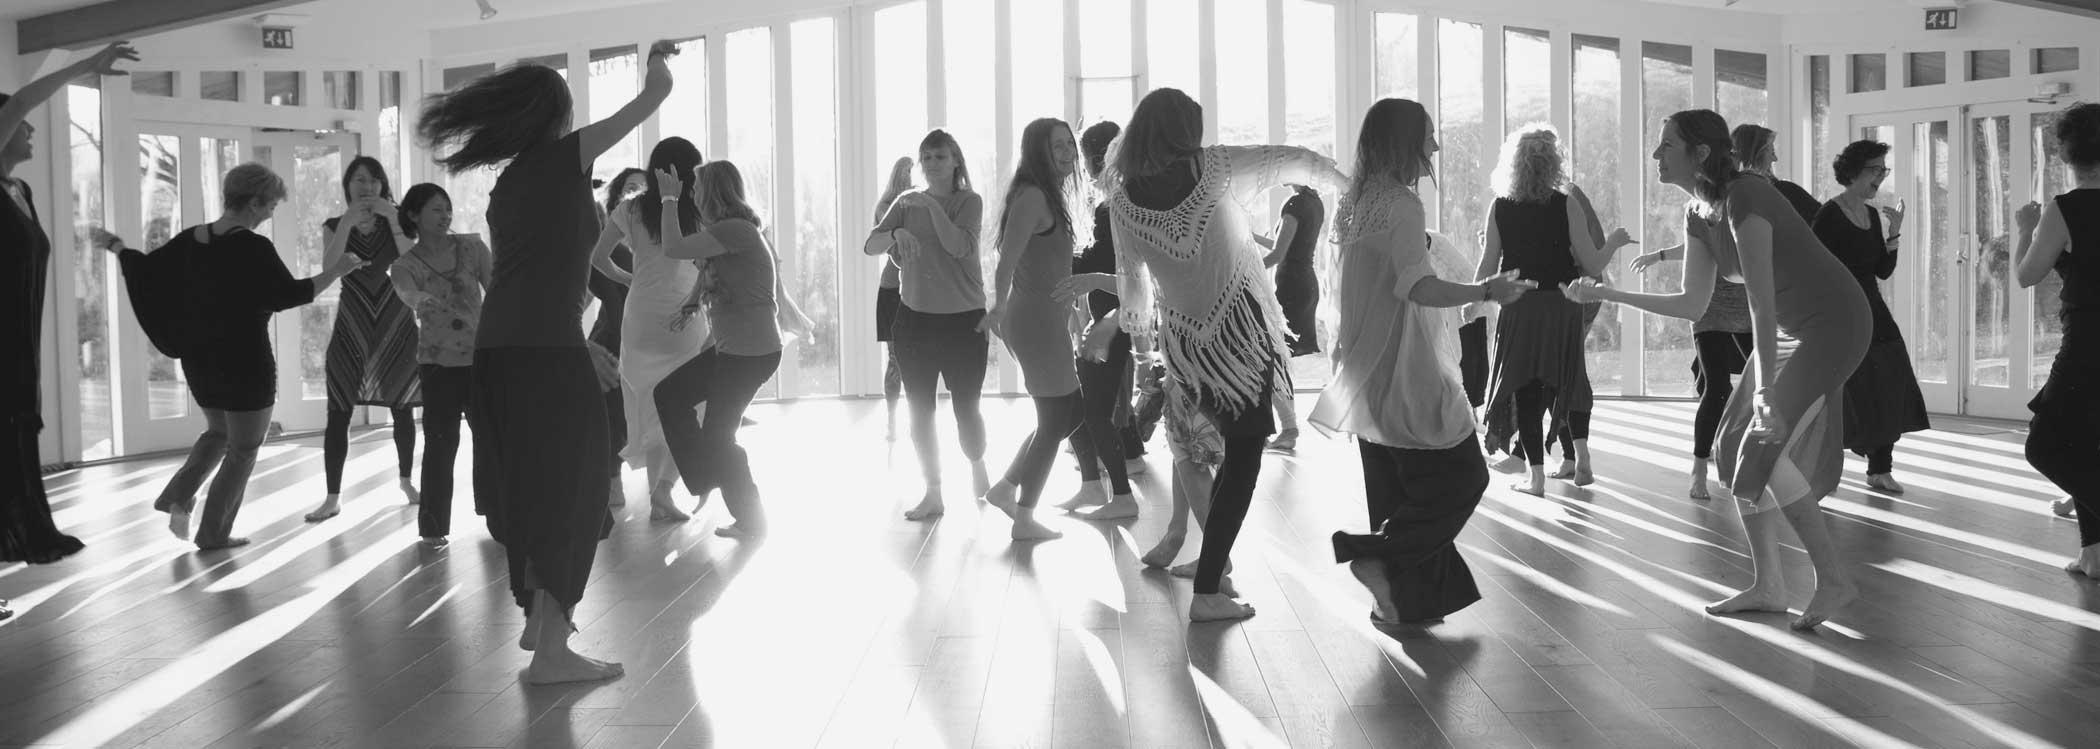 people dancing movement medicine in a workshop